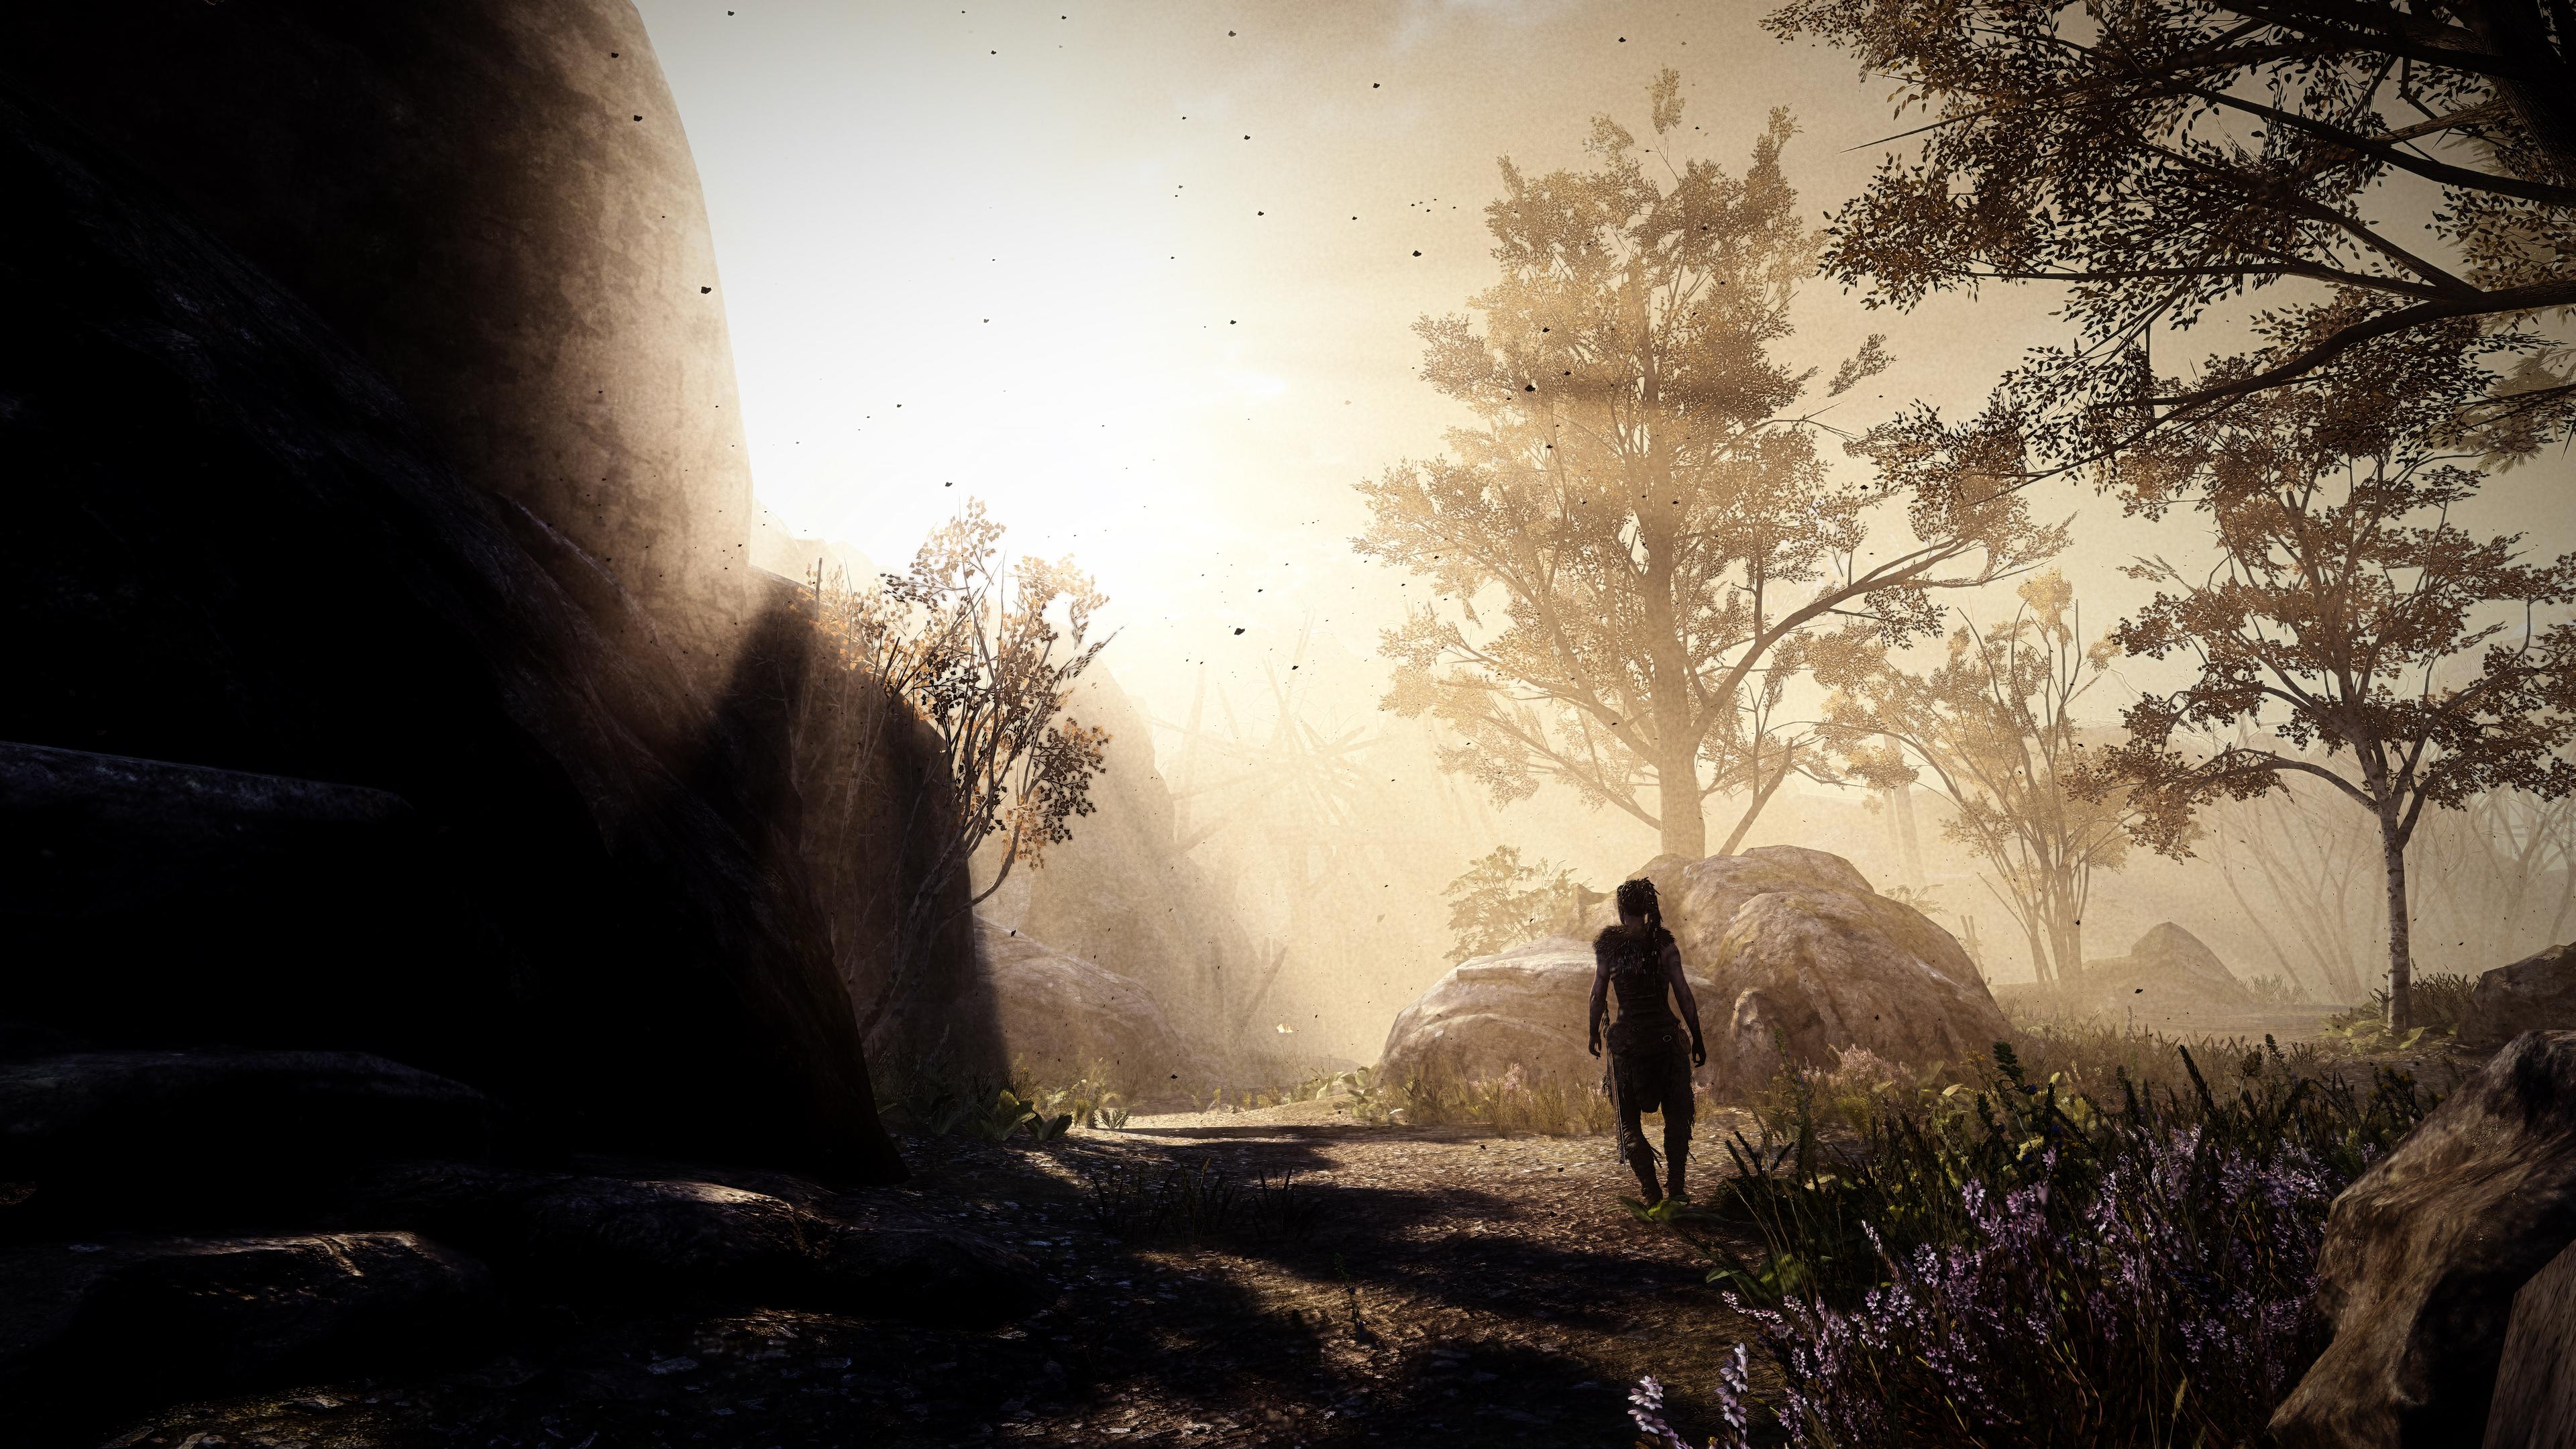 Hellblade Senuas Sacrifice Game 2019 4k Hd Games 4k